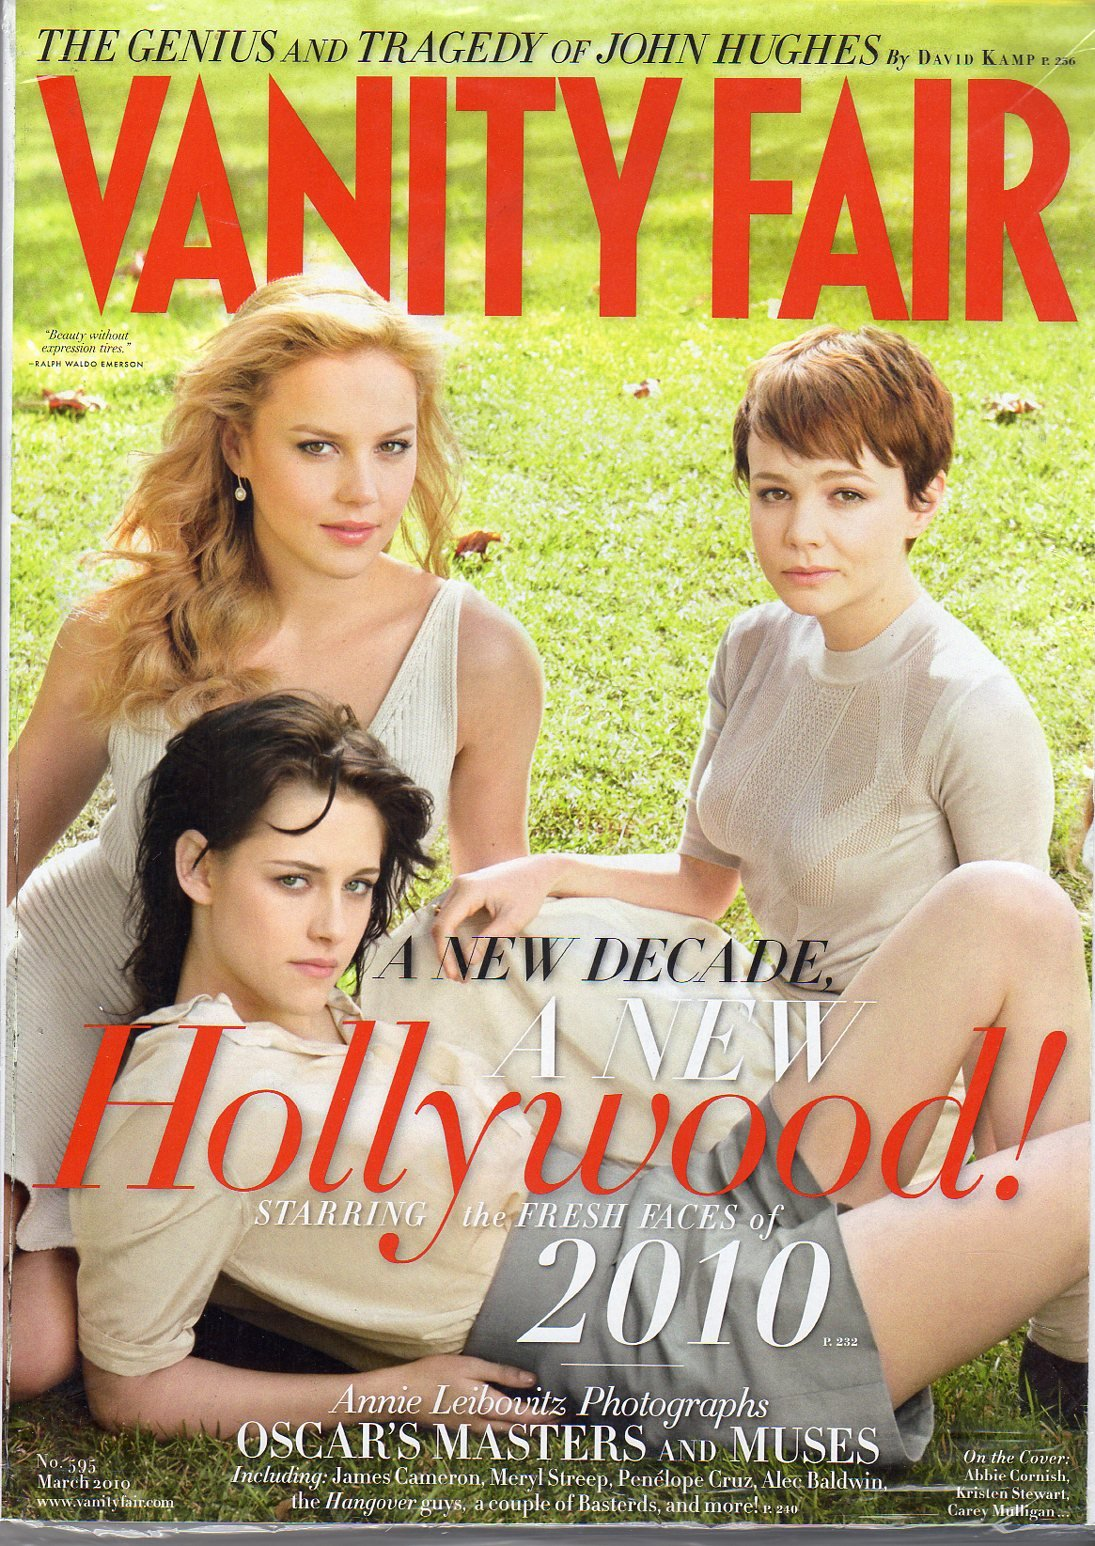 Vanity Fair No 595 March 2010 (KRISTEN STEWART, ABBY CORNISH, CAREY MULLIGAN...) pdf